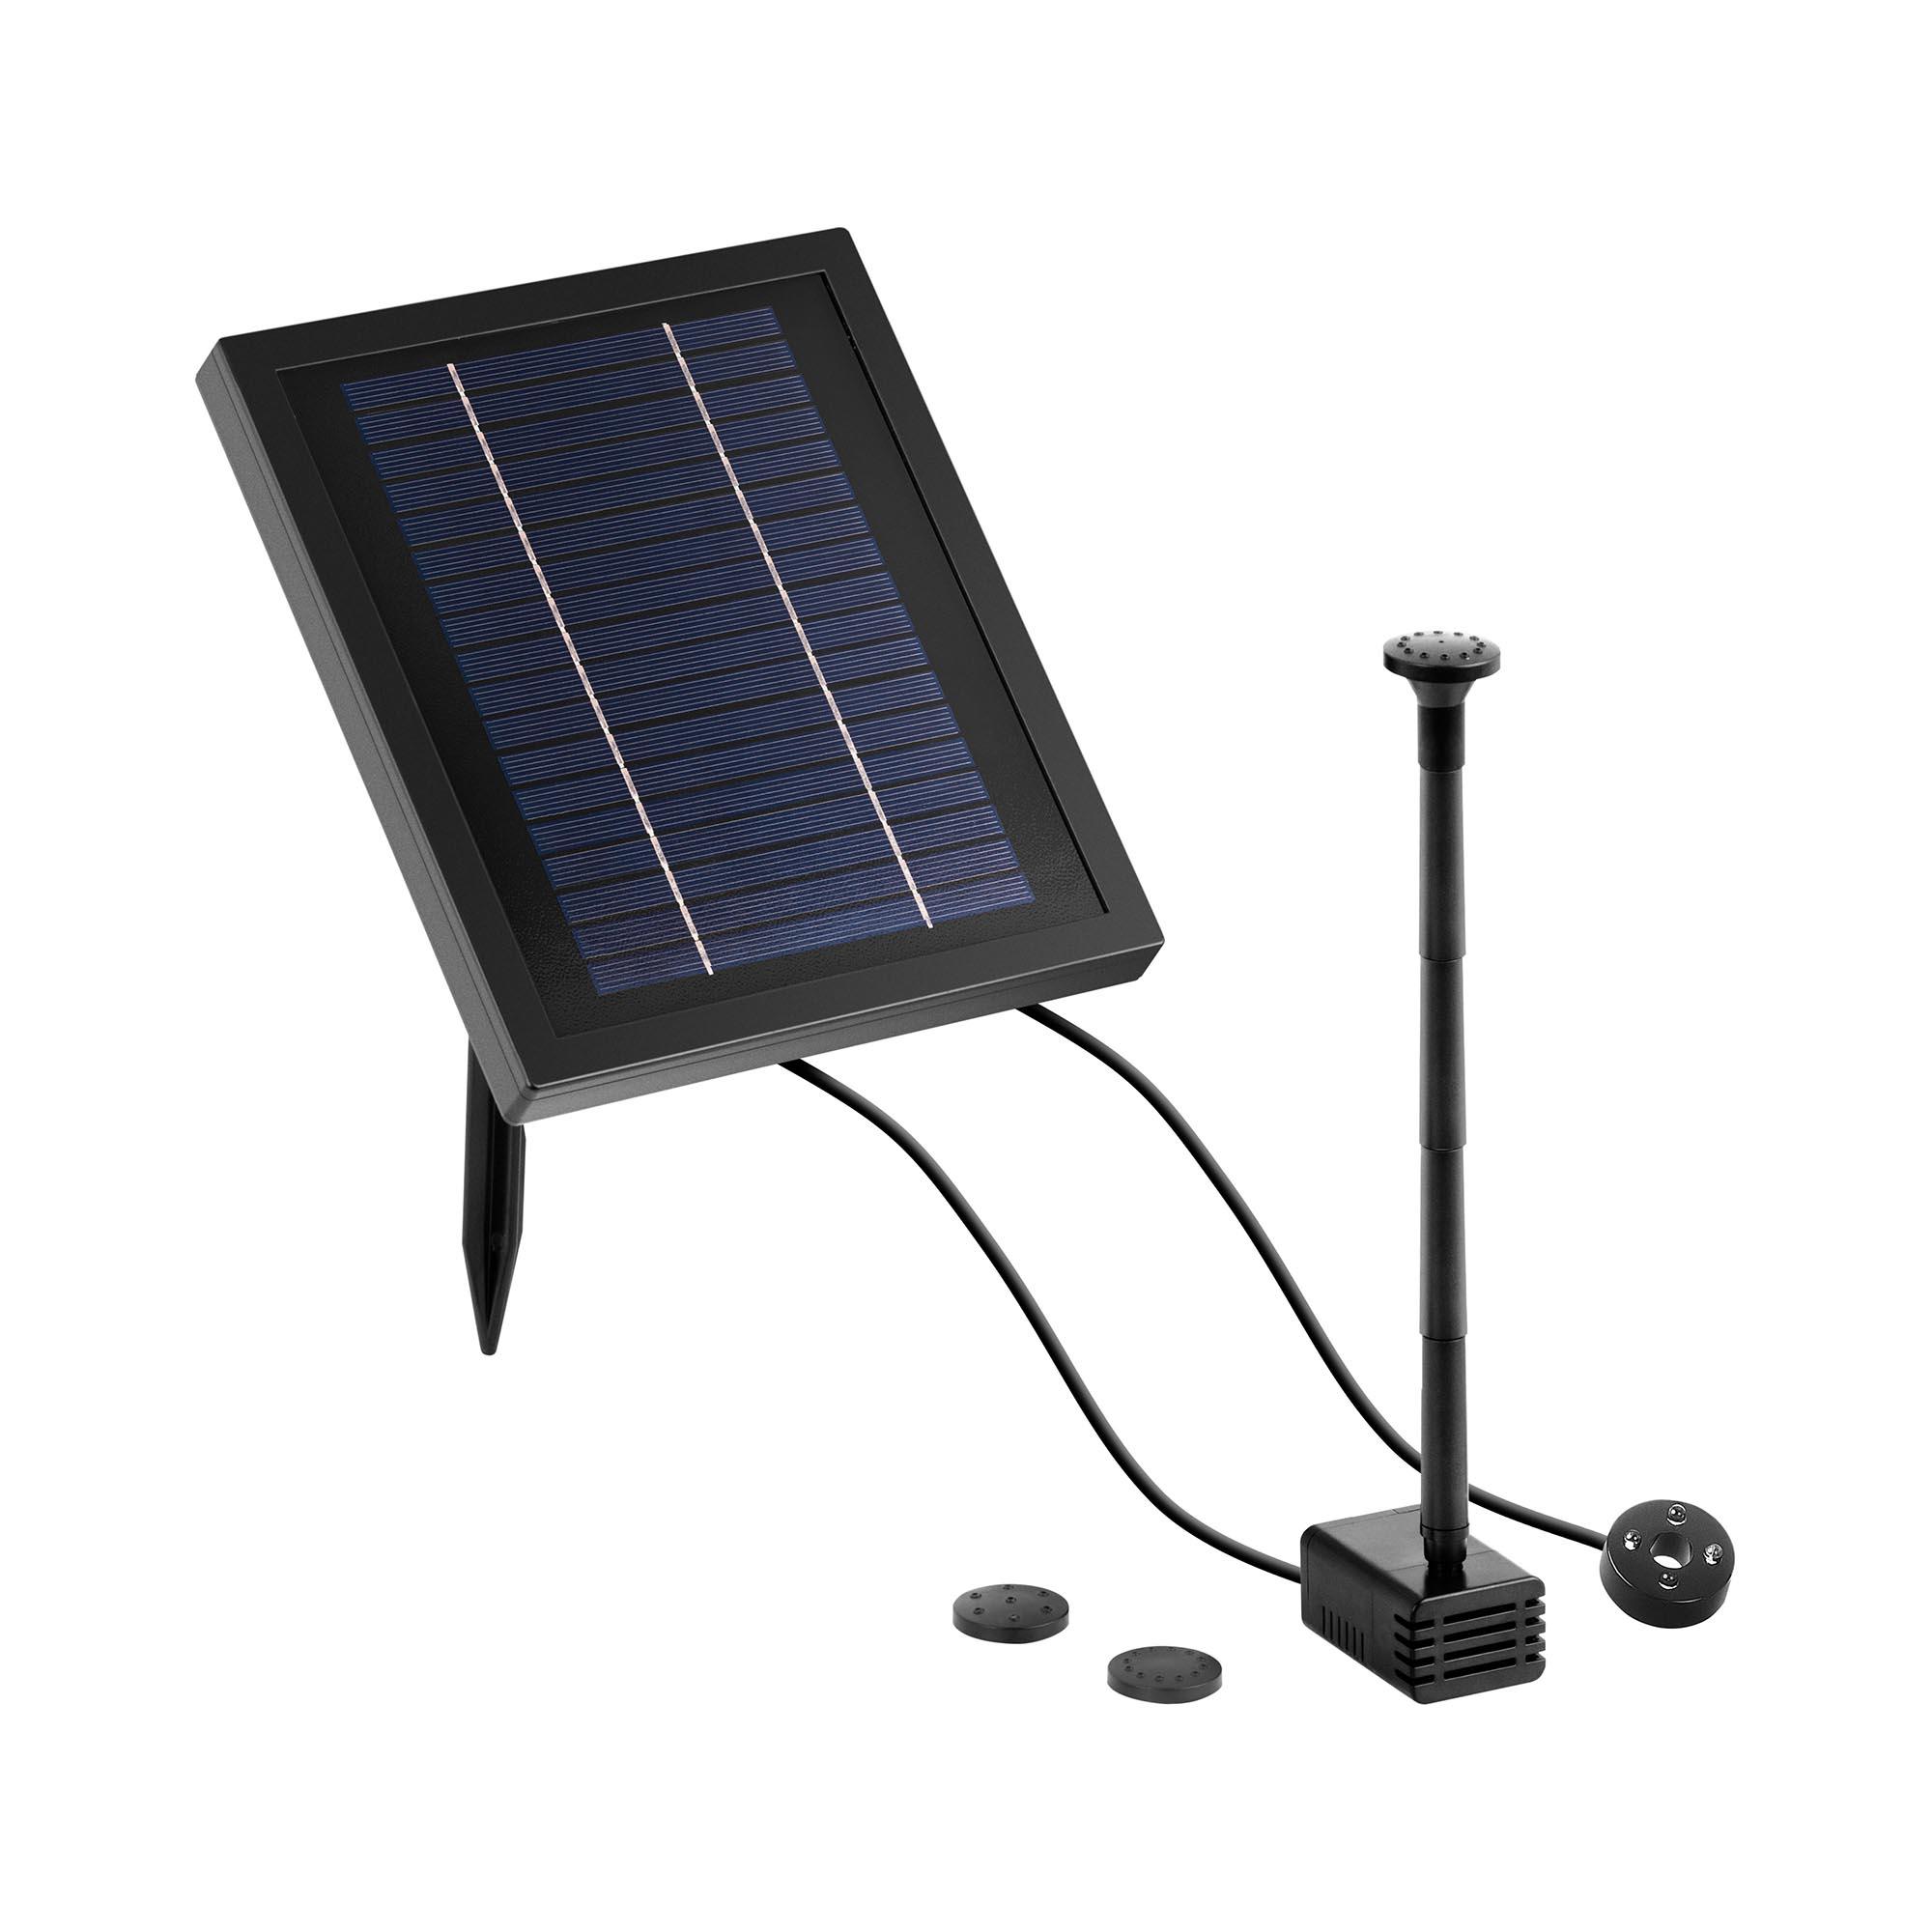 Uniprodo Solar-Springbrunnen - 250 l/h - LED UNI_PUMP_11